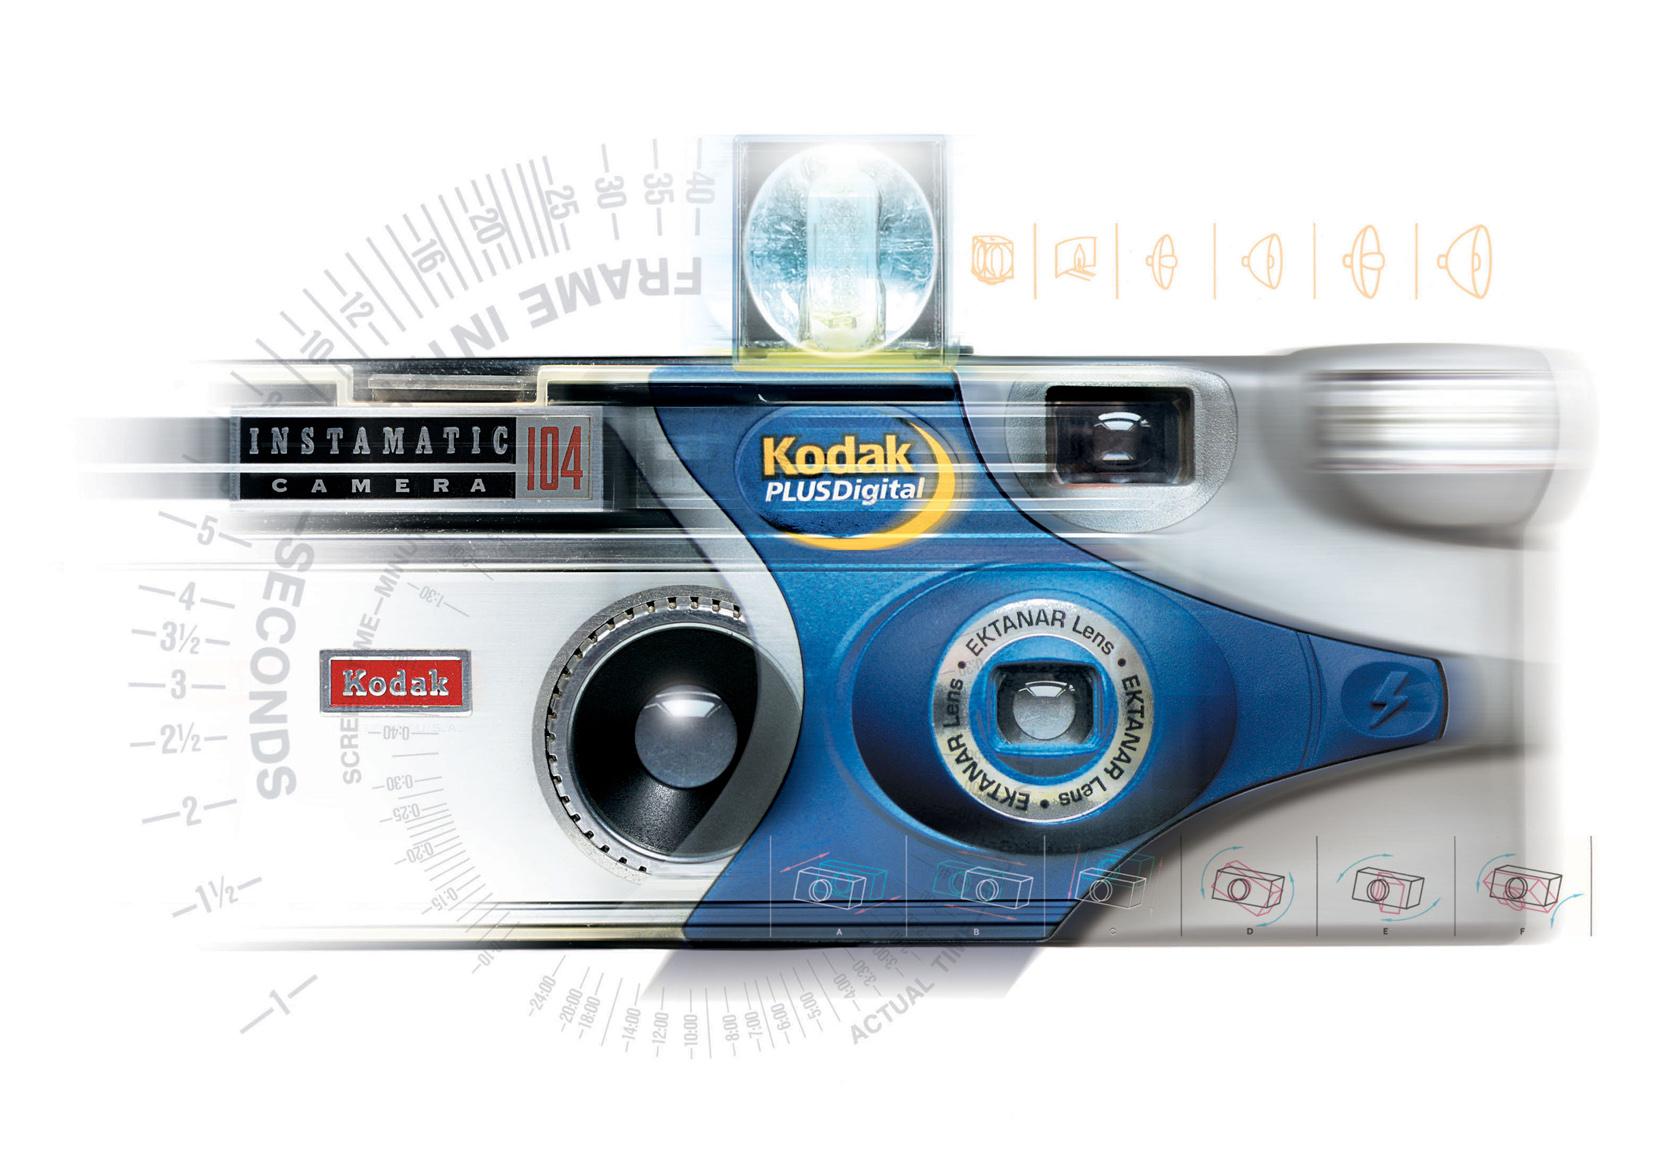 The Kodak Cameras Time Magazine